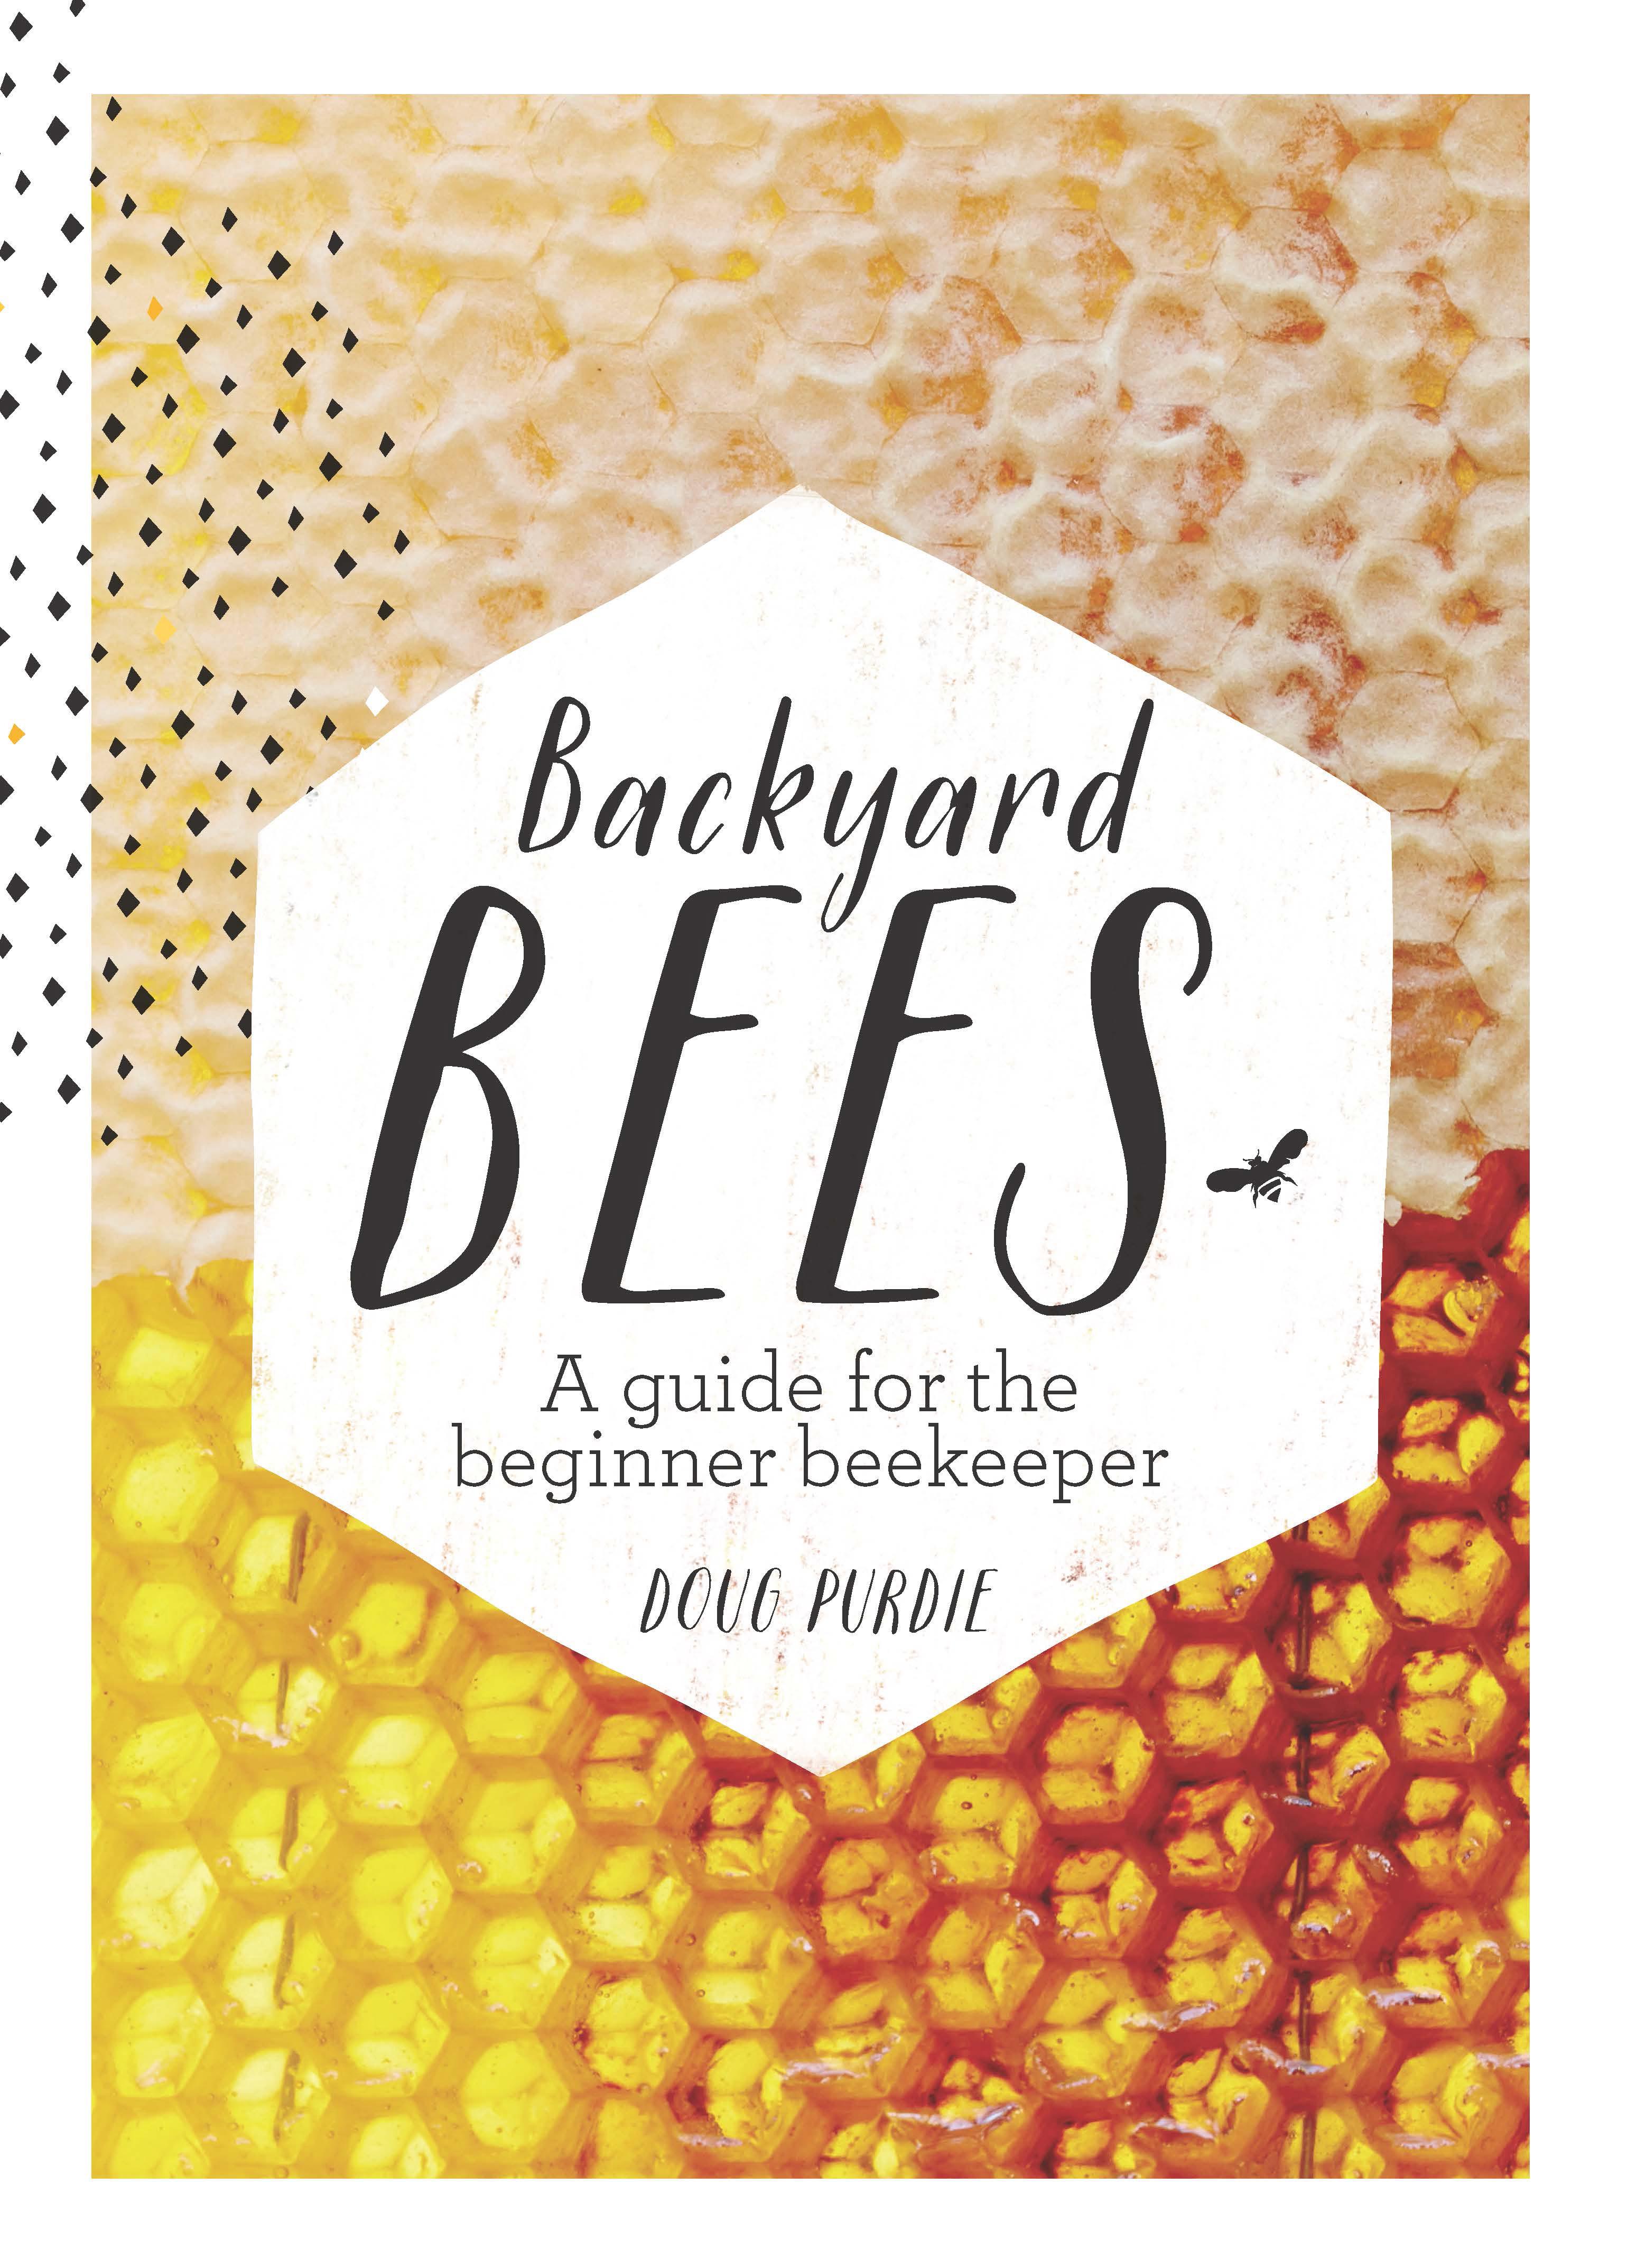 backyard bees doug purdie 9781743361719 murdoch books